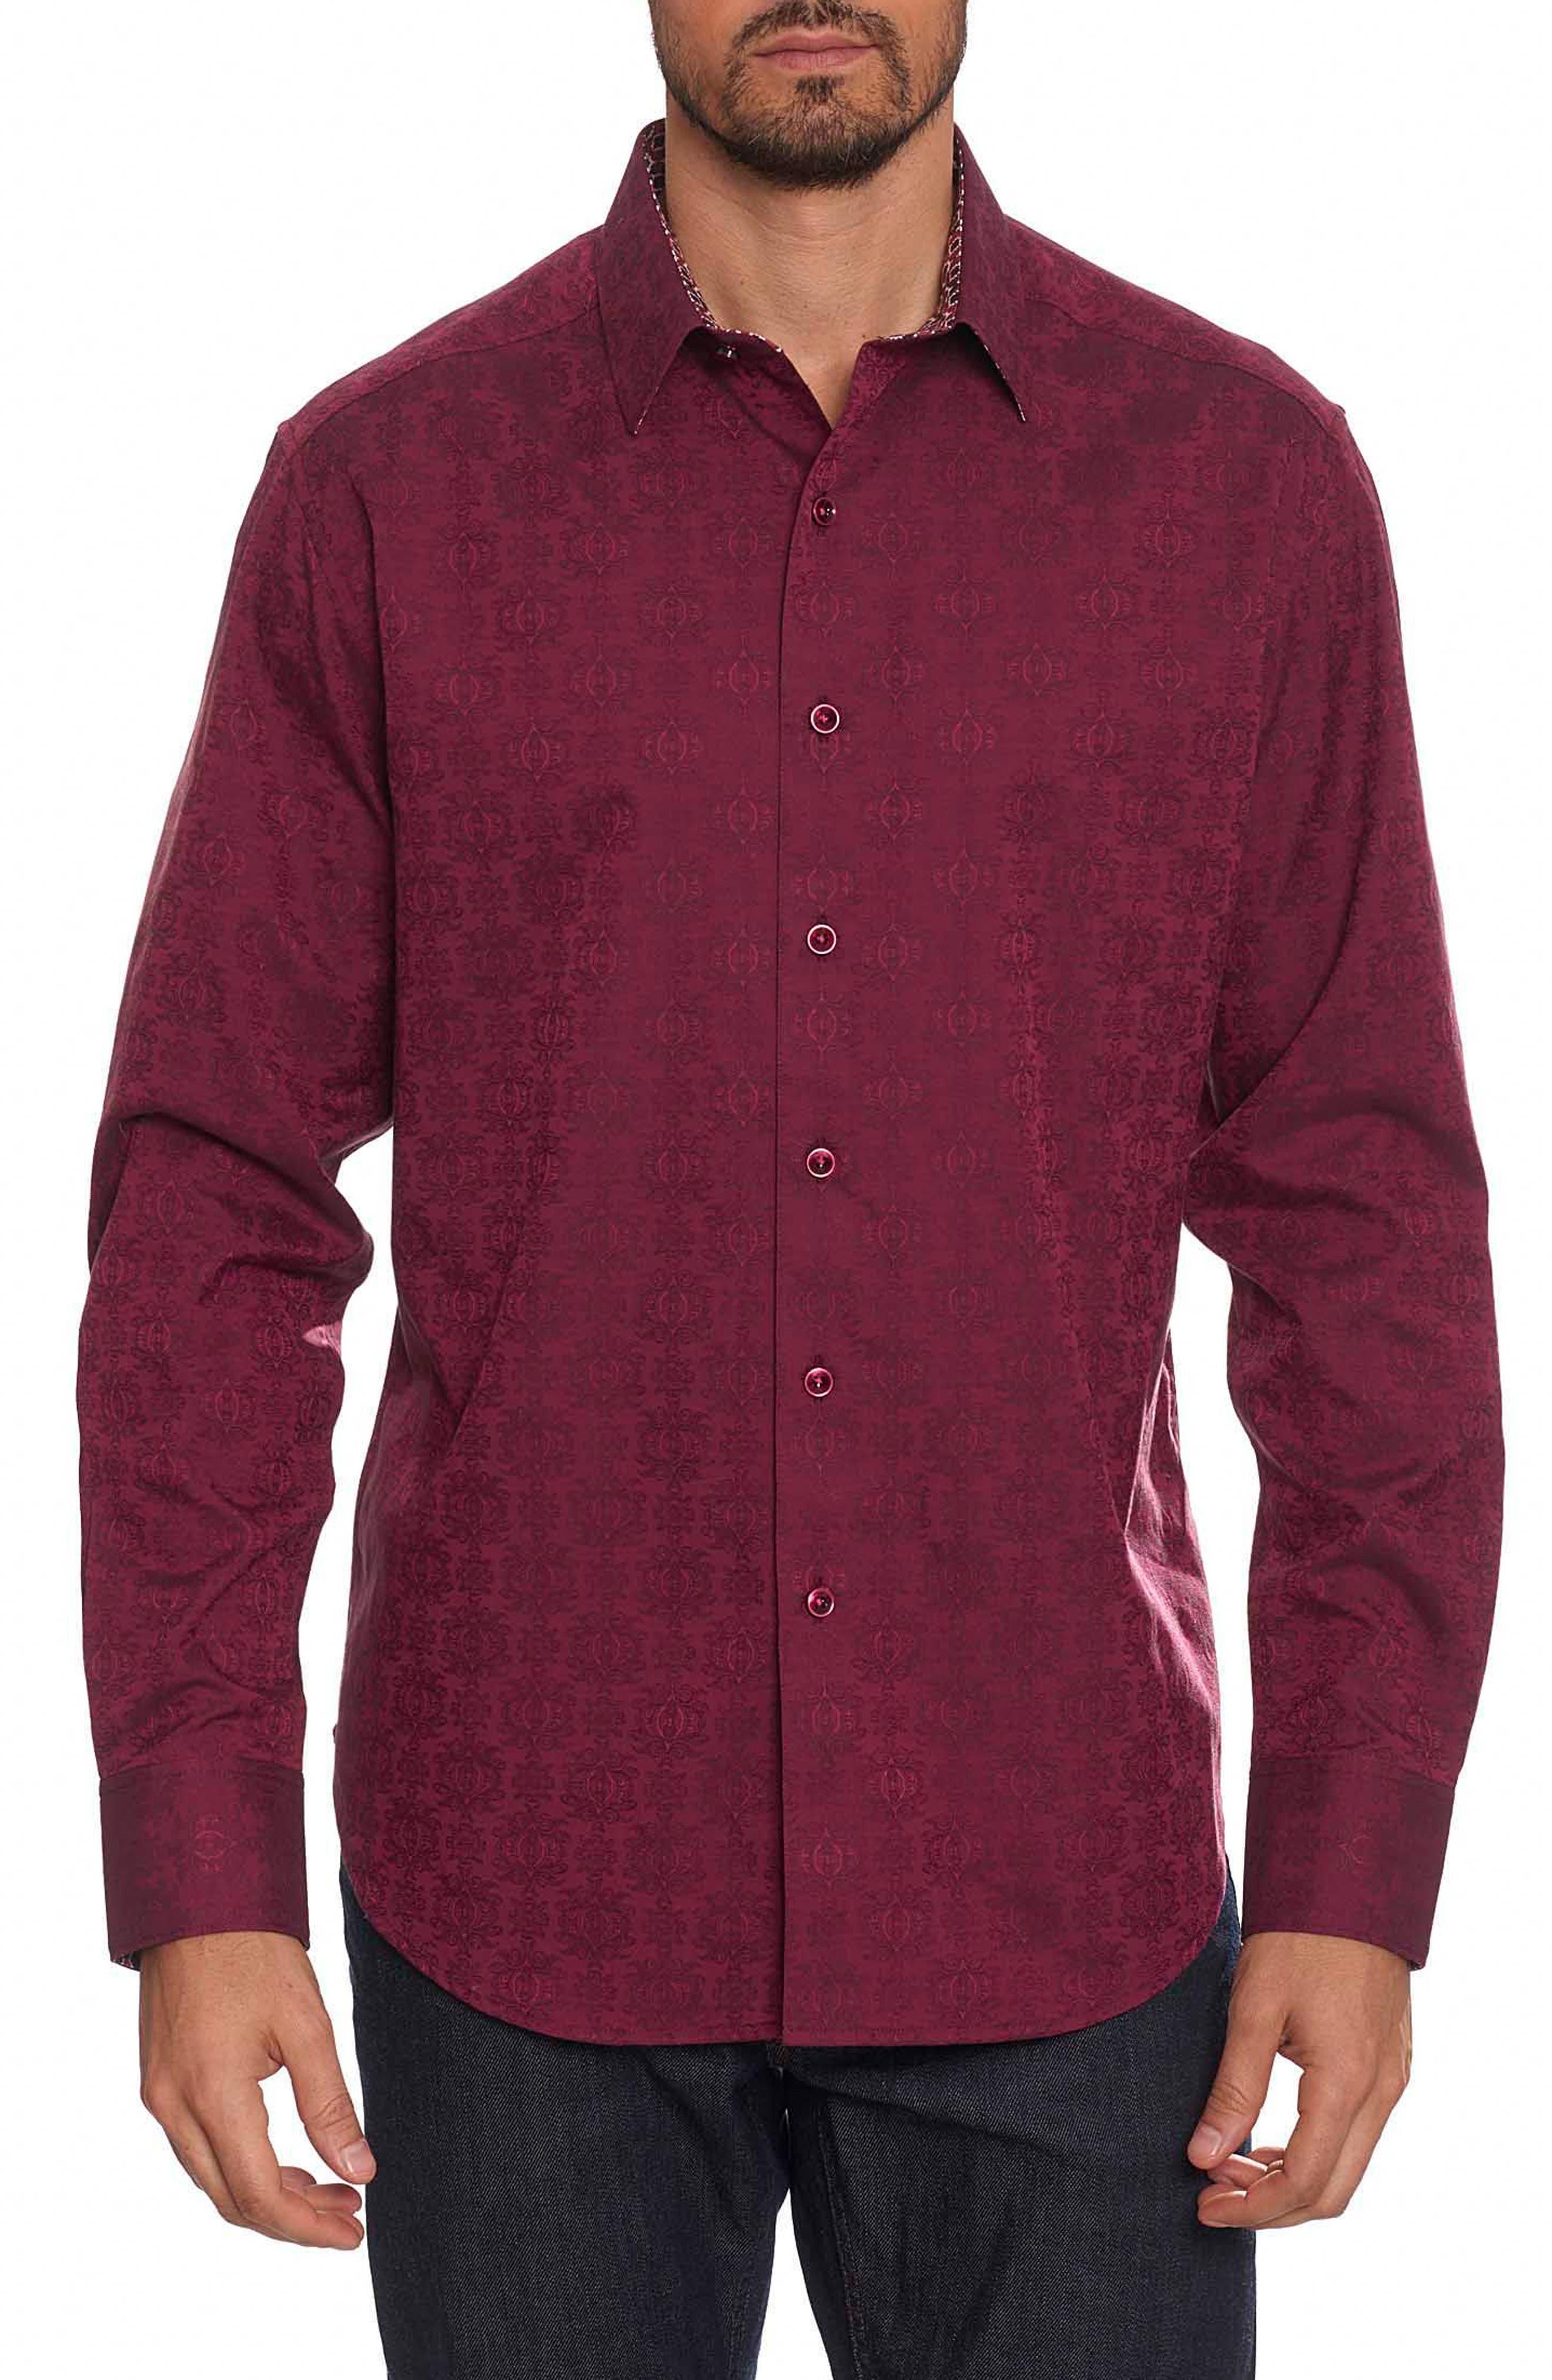 Cullen Classic Fit Jacquard Sport Shirt,                         Main,                         color,